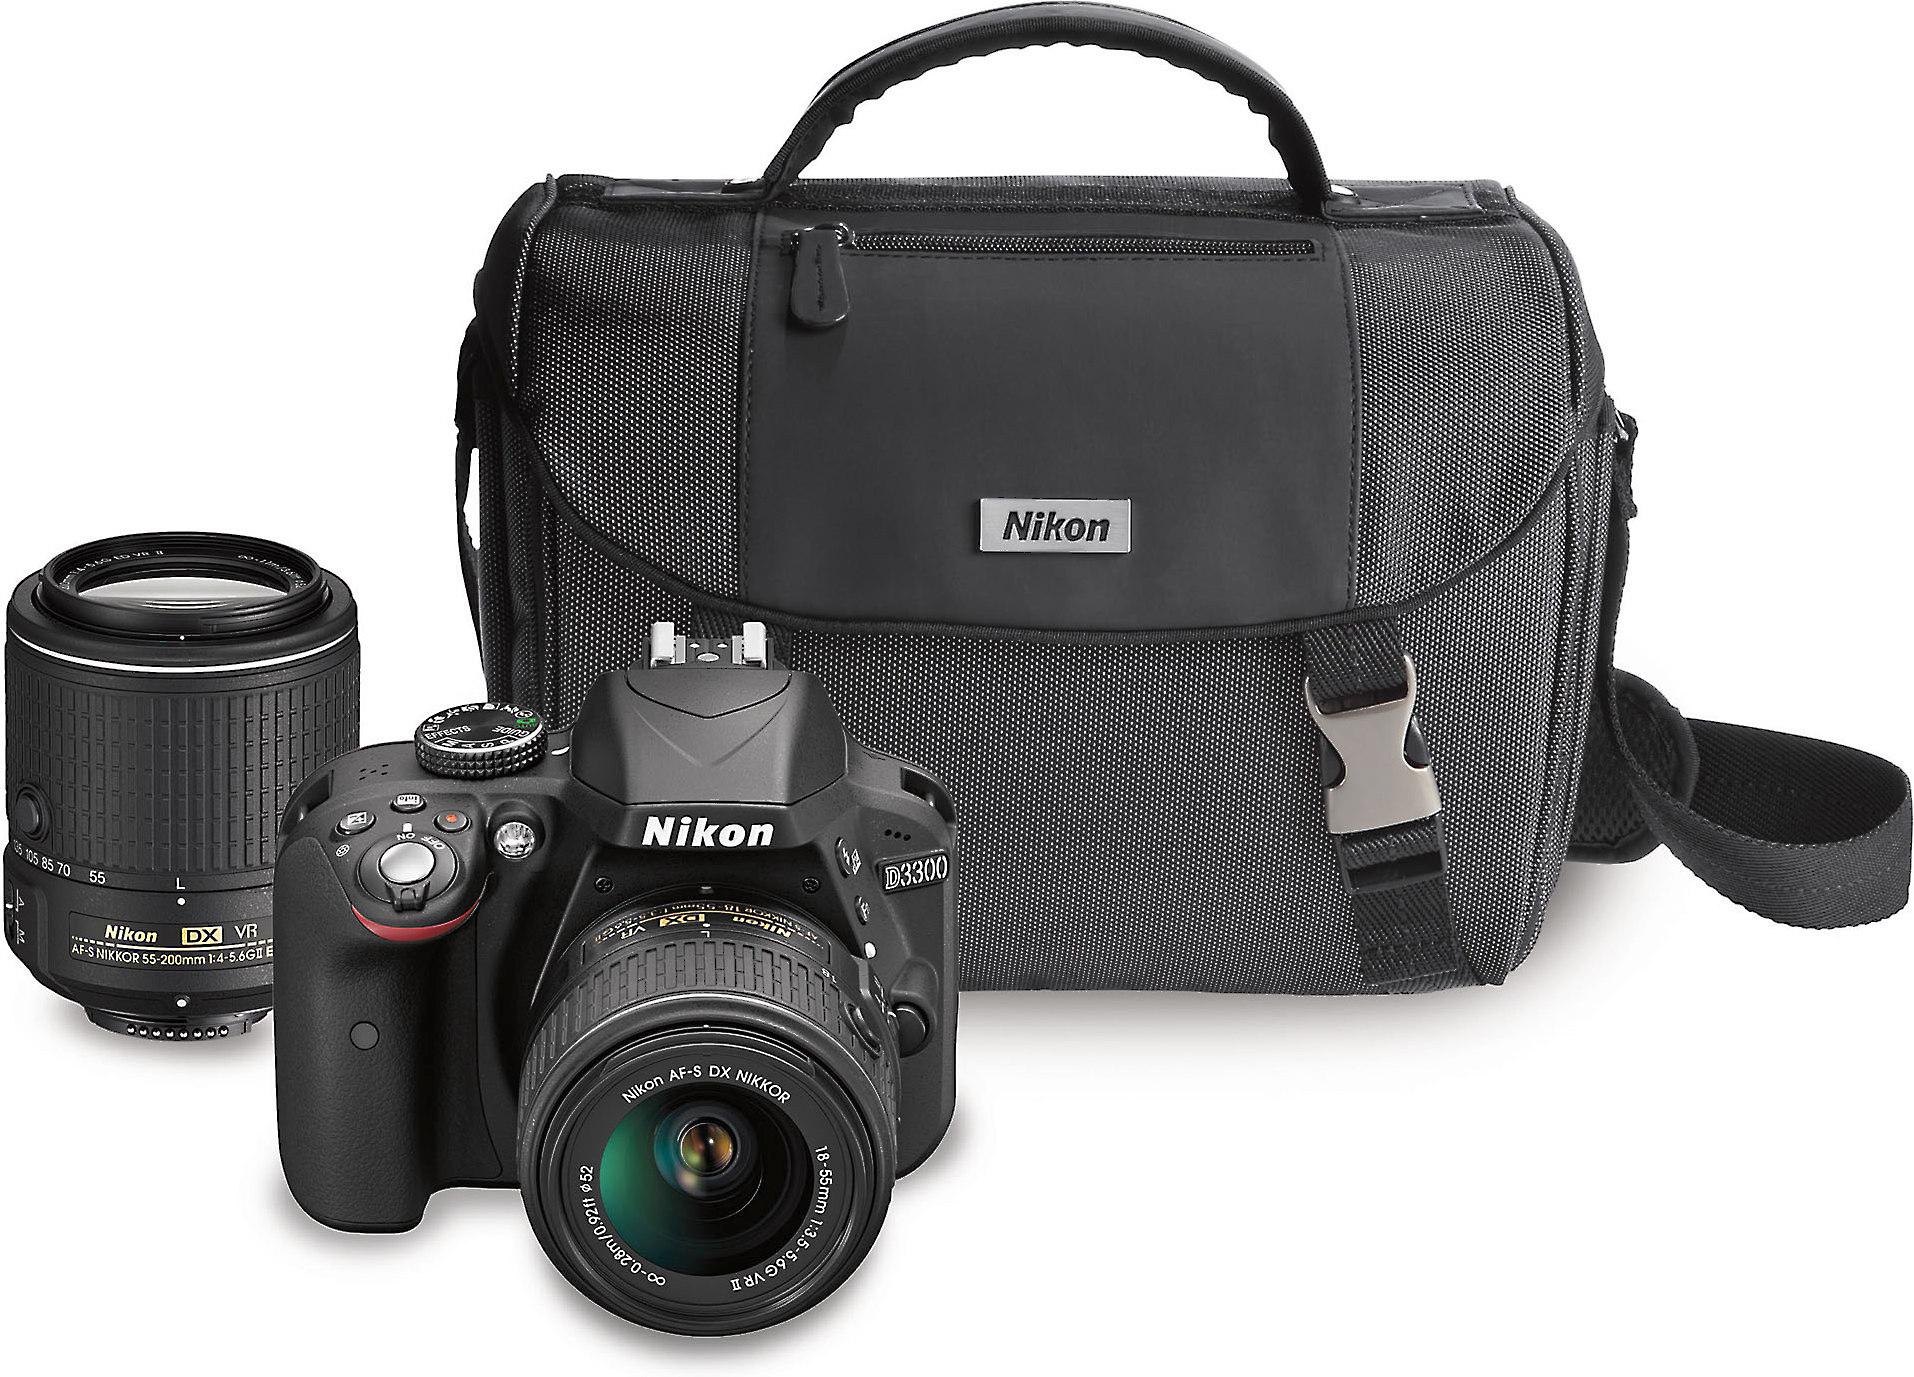 Gadget Career 52mm Neutral Density ND4 Filter for Nikon AF-S DX Nikkor 18-55mm f//3.5-5.6G II 18-55mm f//3.5-5.6G VR 18-55mm f//3.5-5.6G VR II